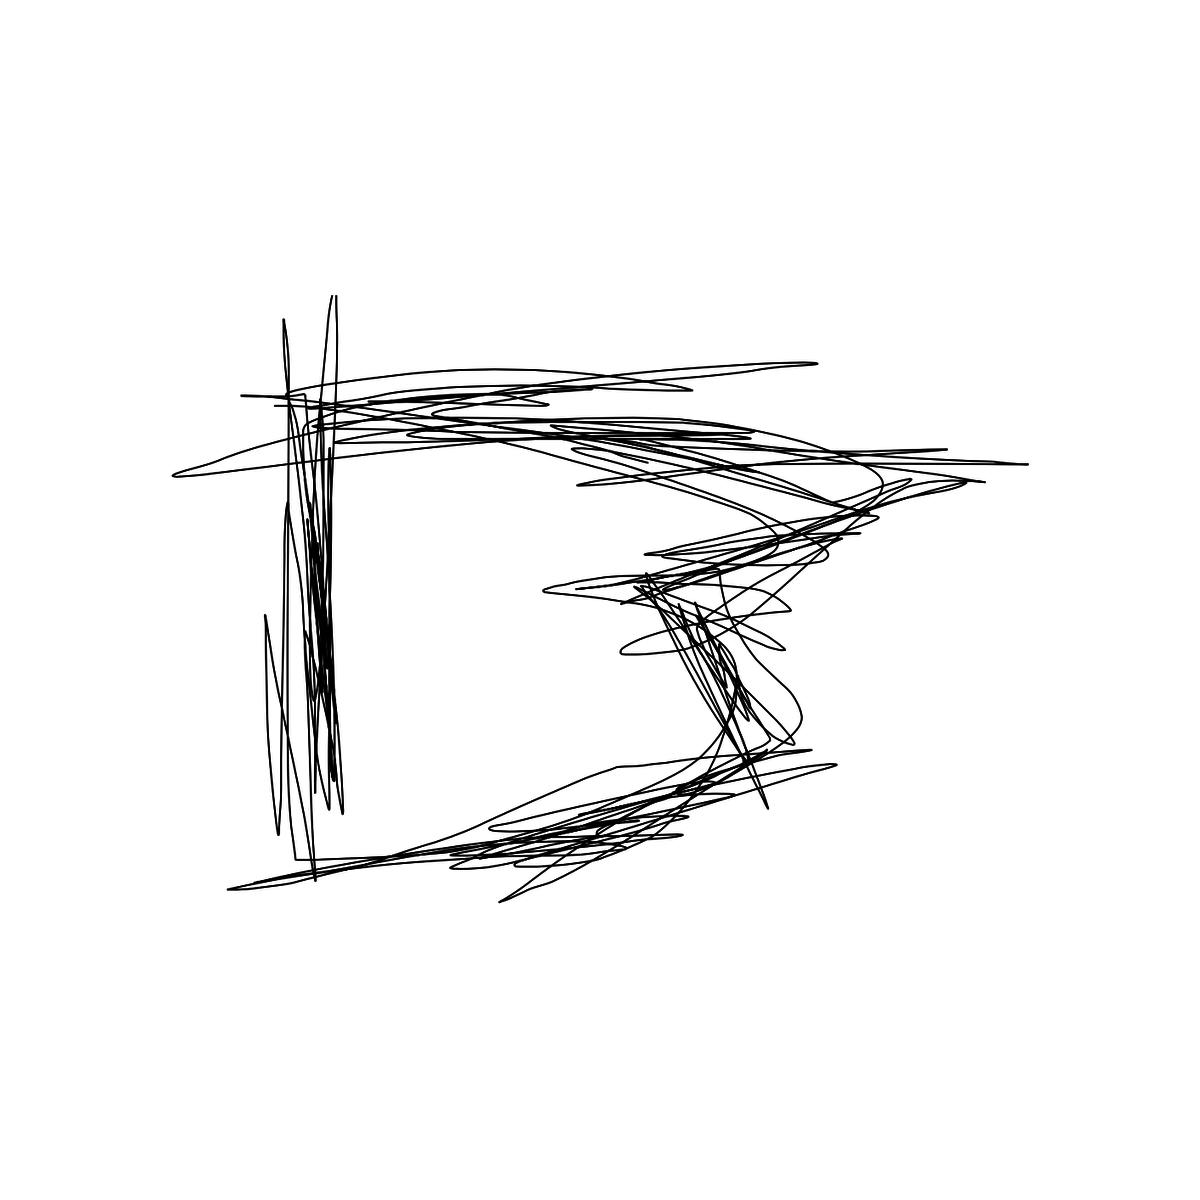 BAAAM drawing#220 lat:42.3359069824218750lng: -71.1704254150390600